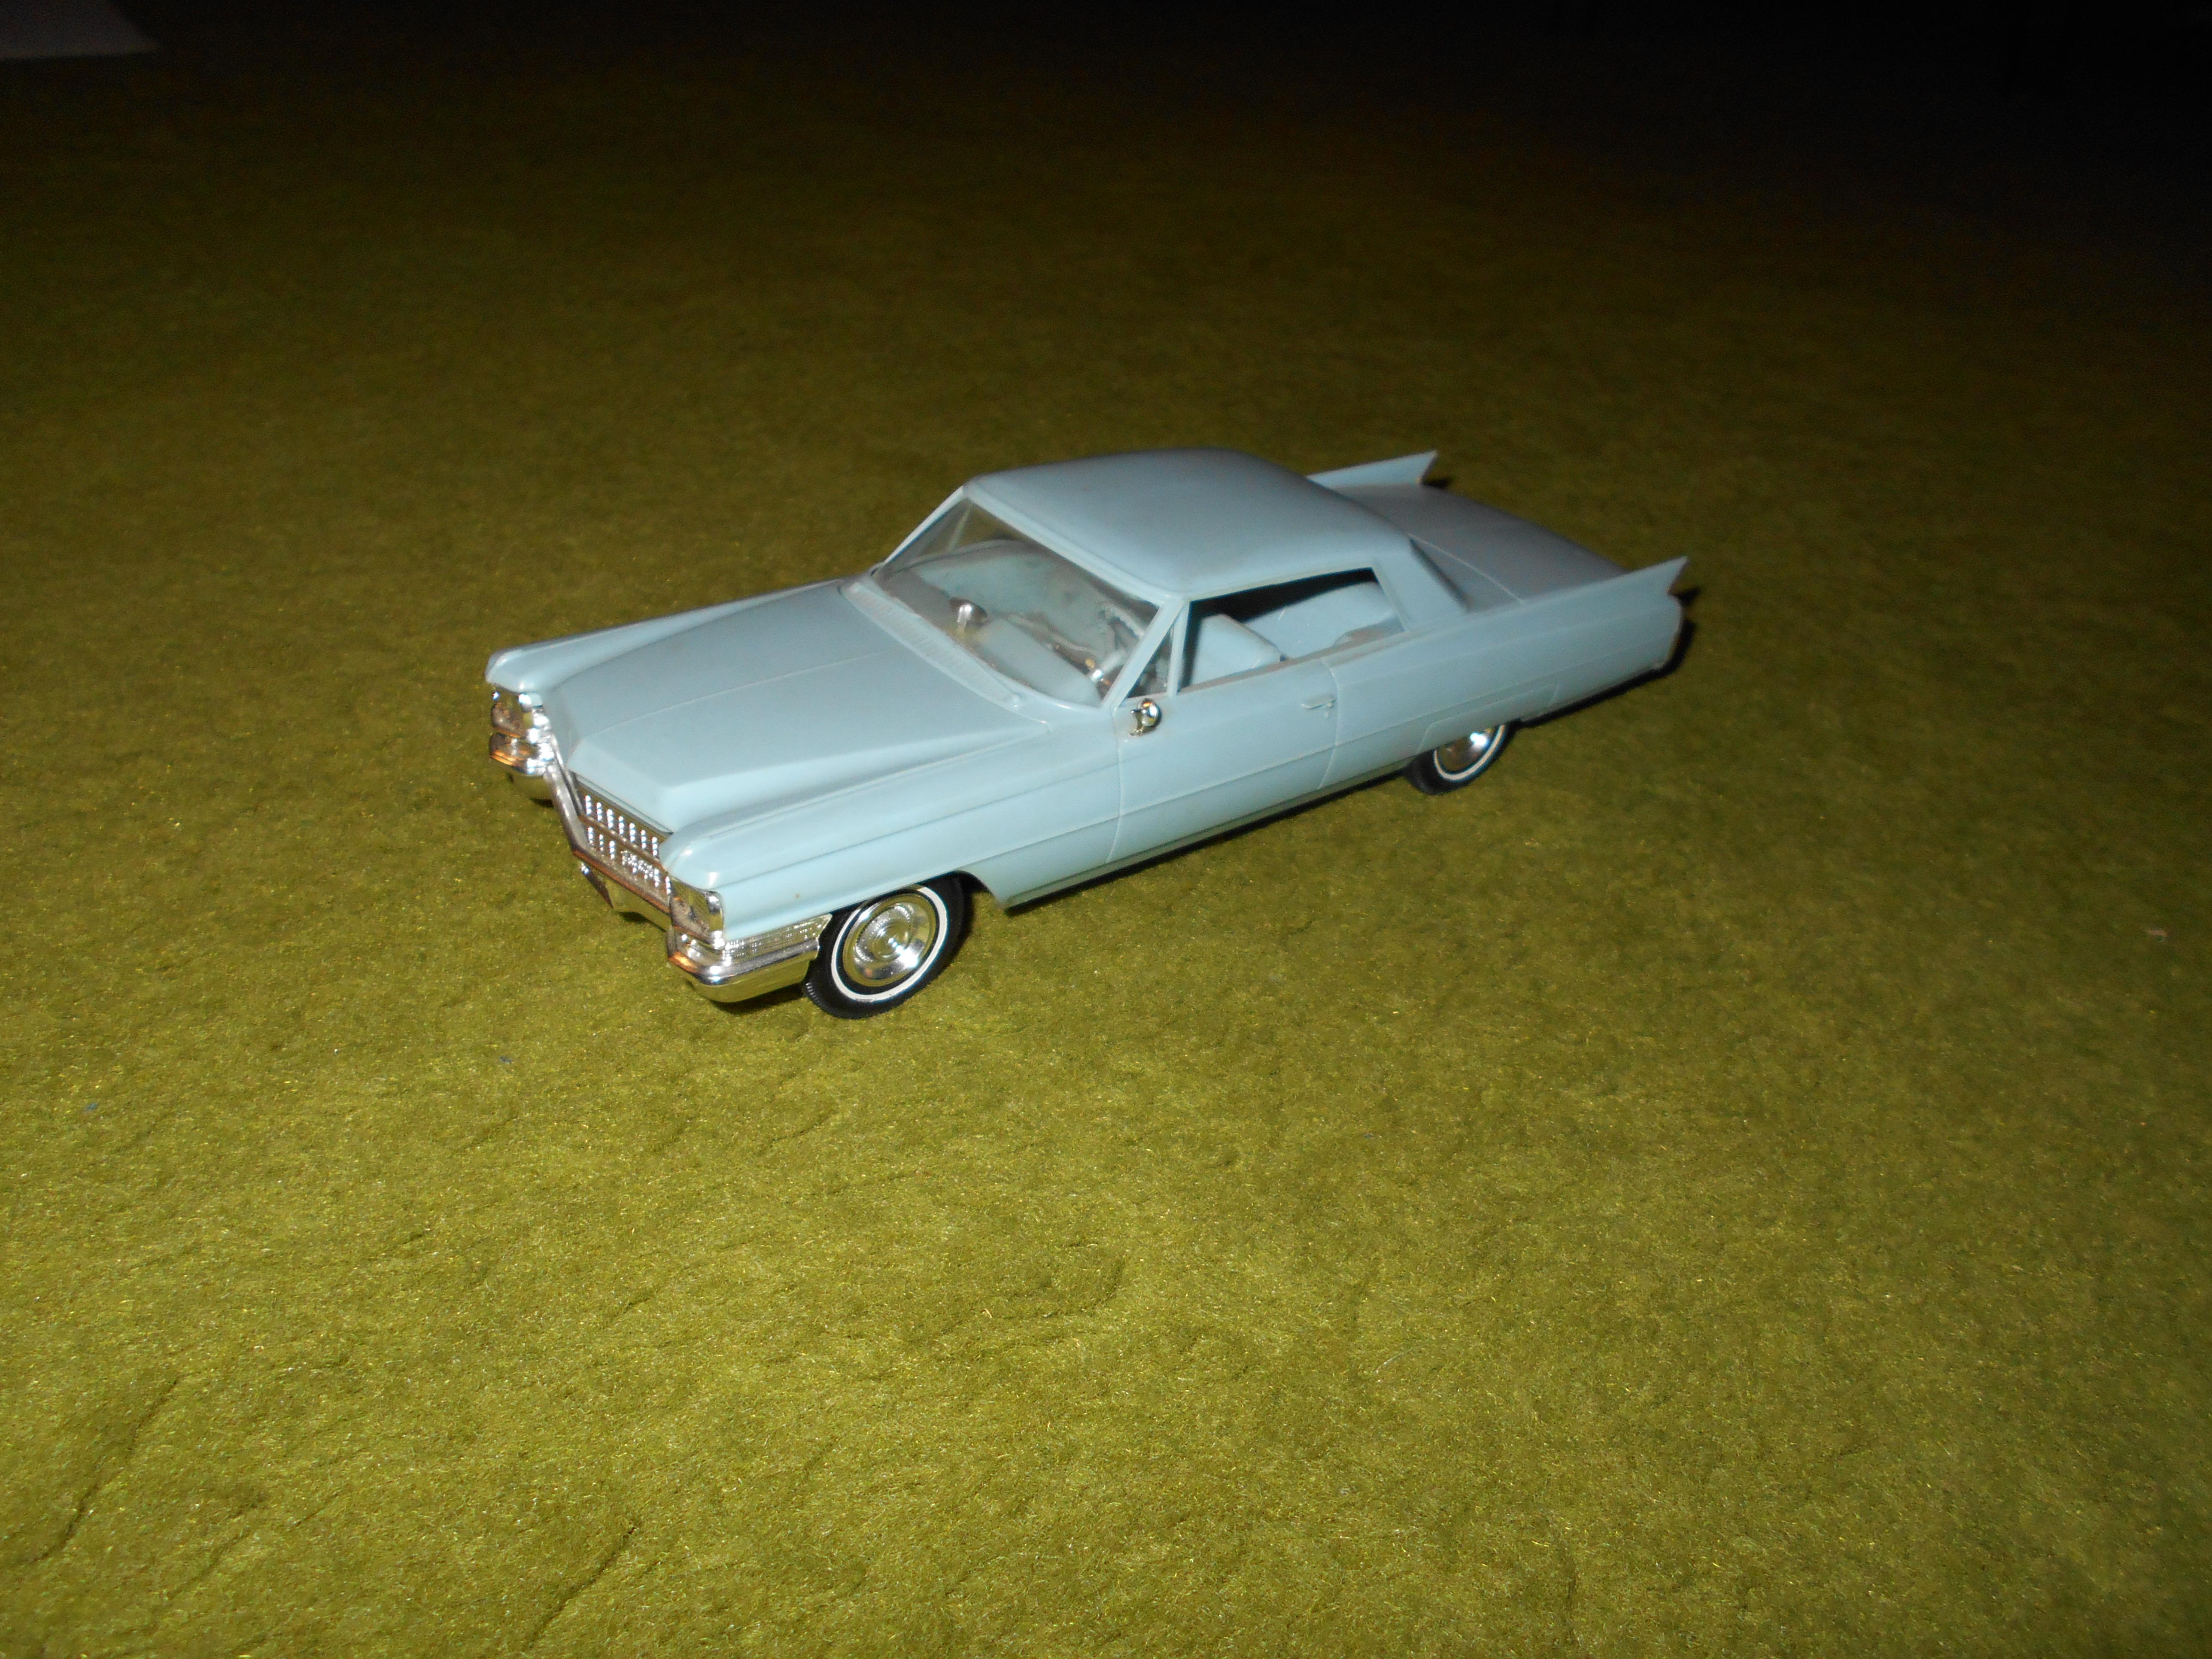 Curbside Classic 1963 Cadillac Park Avenue The Original Seville 1961 Sedan Deville